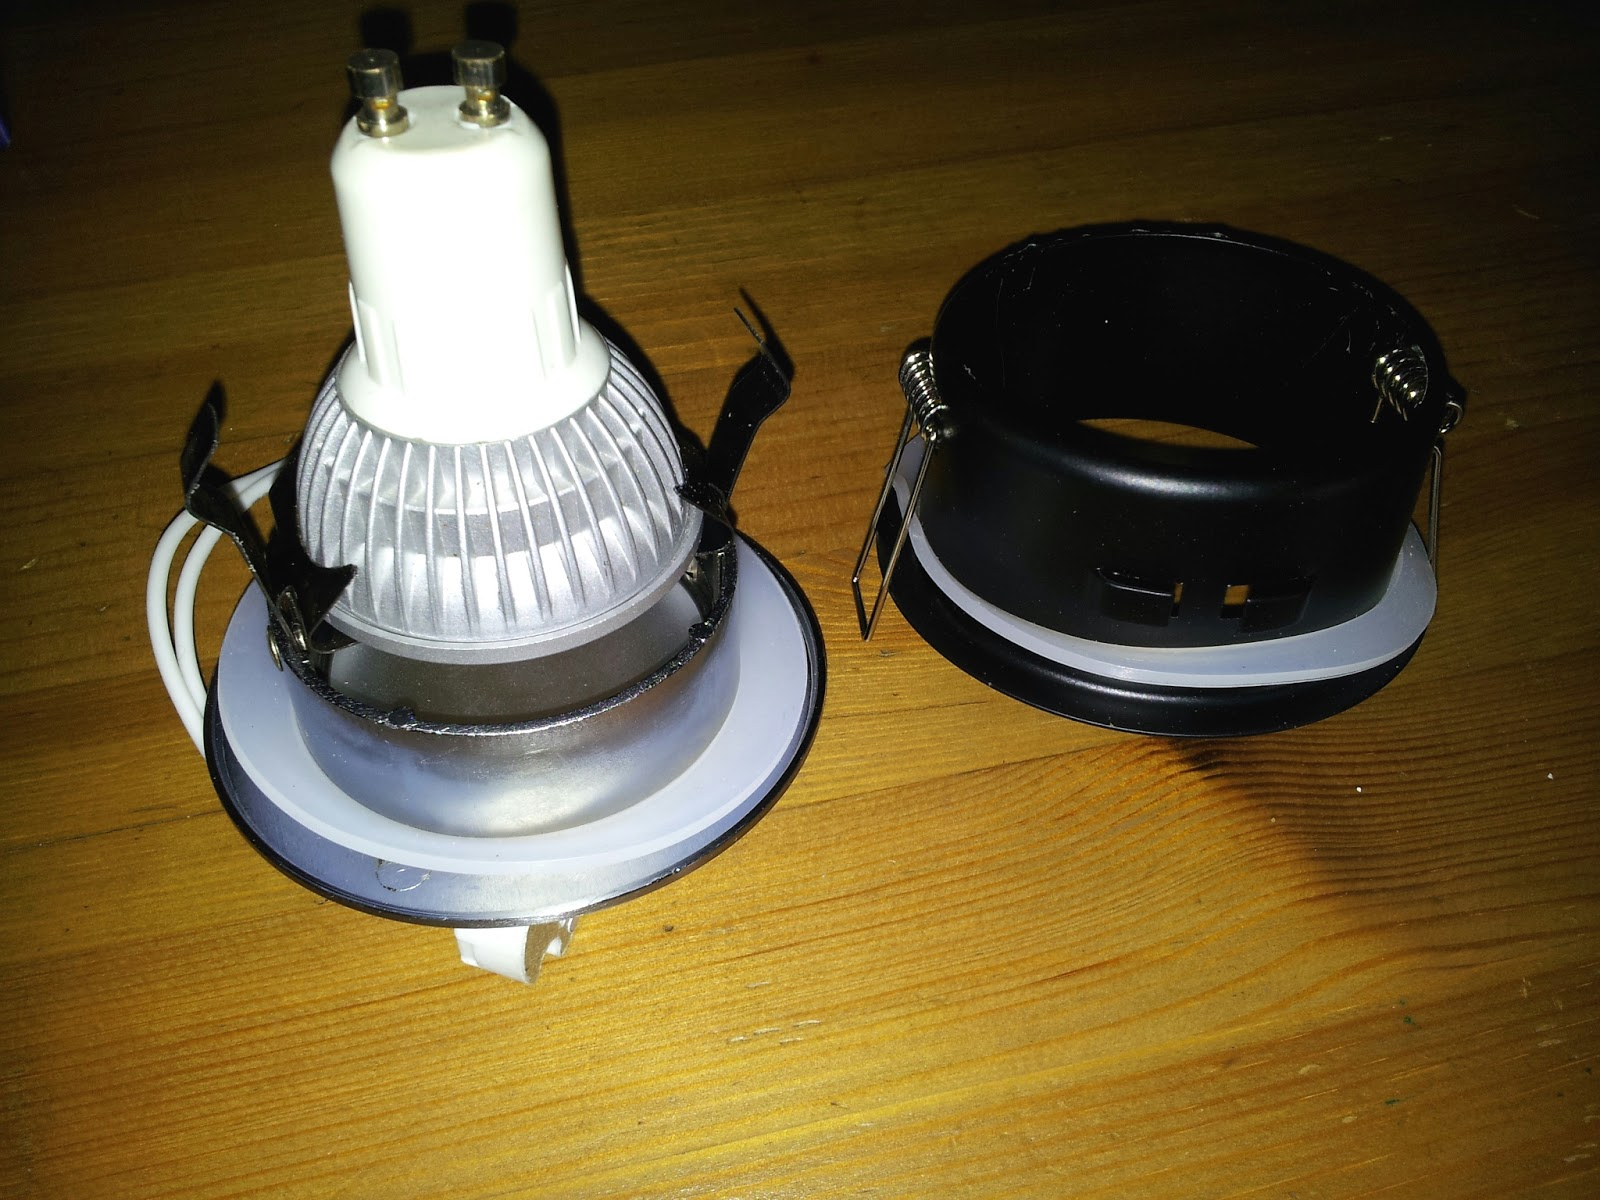 Iluminaci n led ojo de buey para ba o for Precio cambiar sanitarios bano